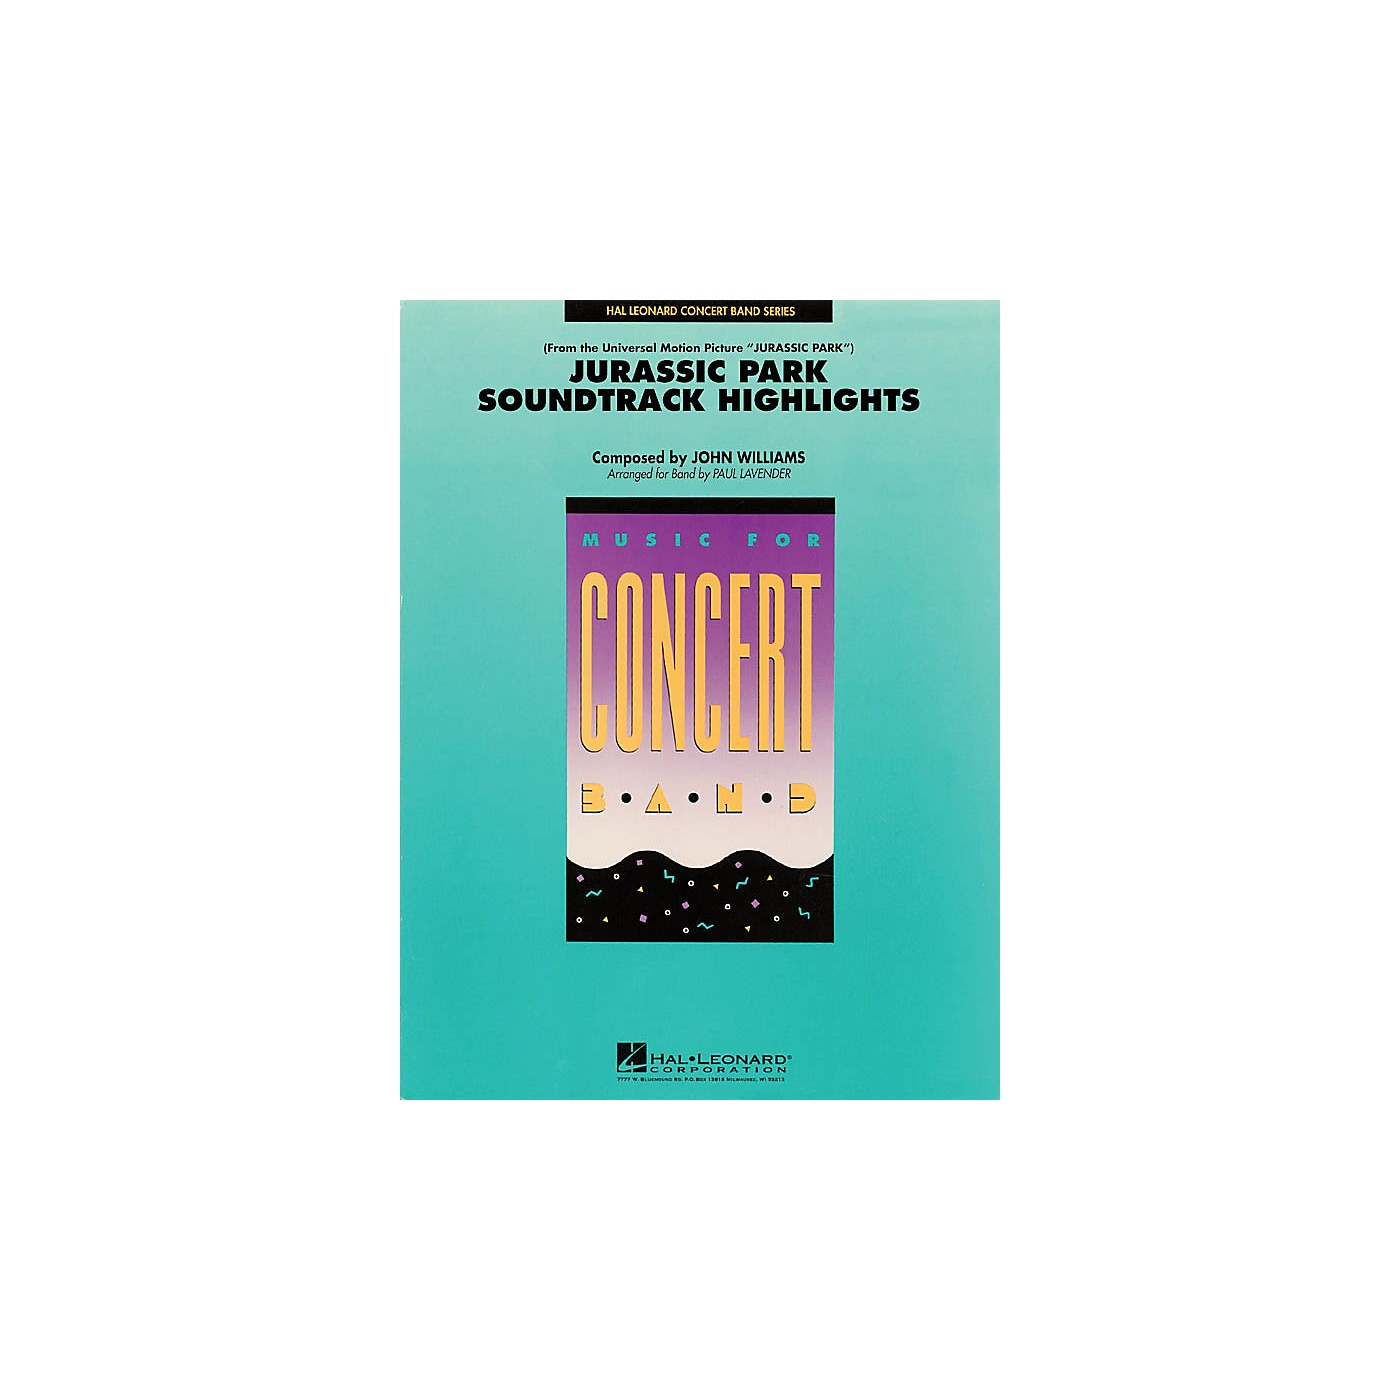 Hal Leonard Jurassic Park Soundtrack Highlights Concert Band Level 4 Arranged by Paul Lavender thumbnail